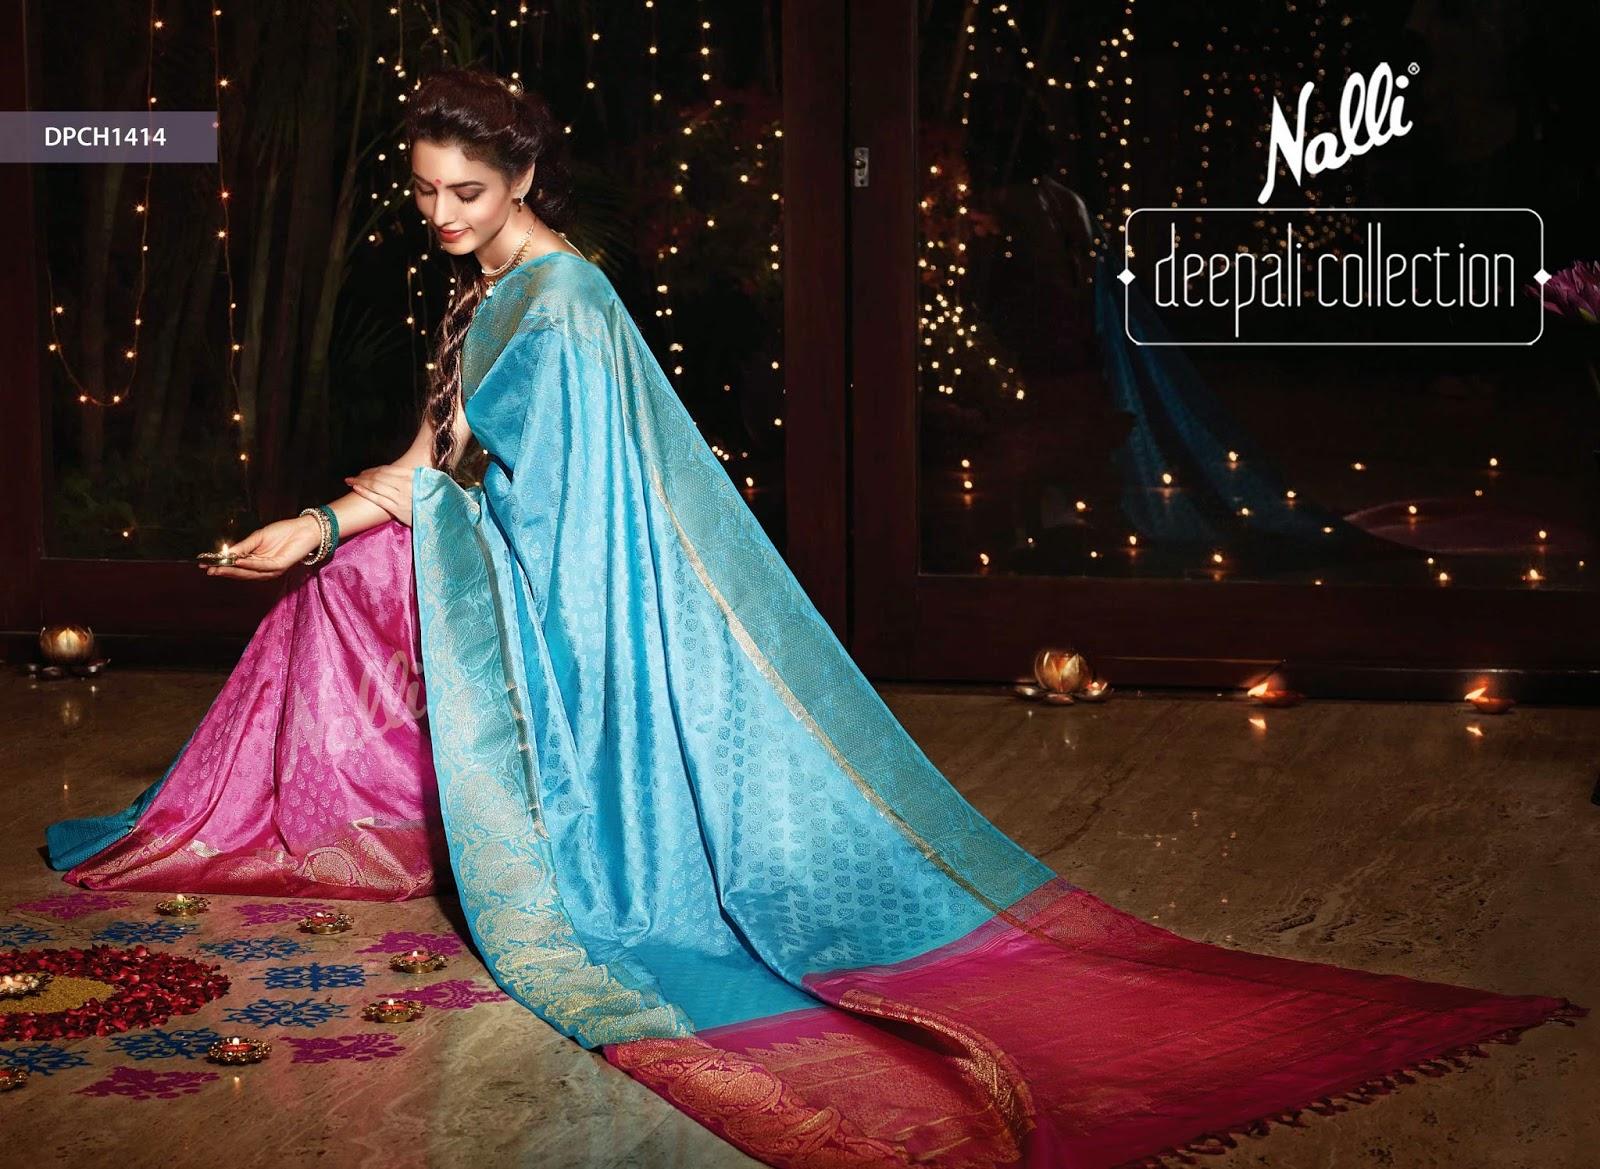 Nalli Deepali Collection